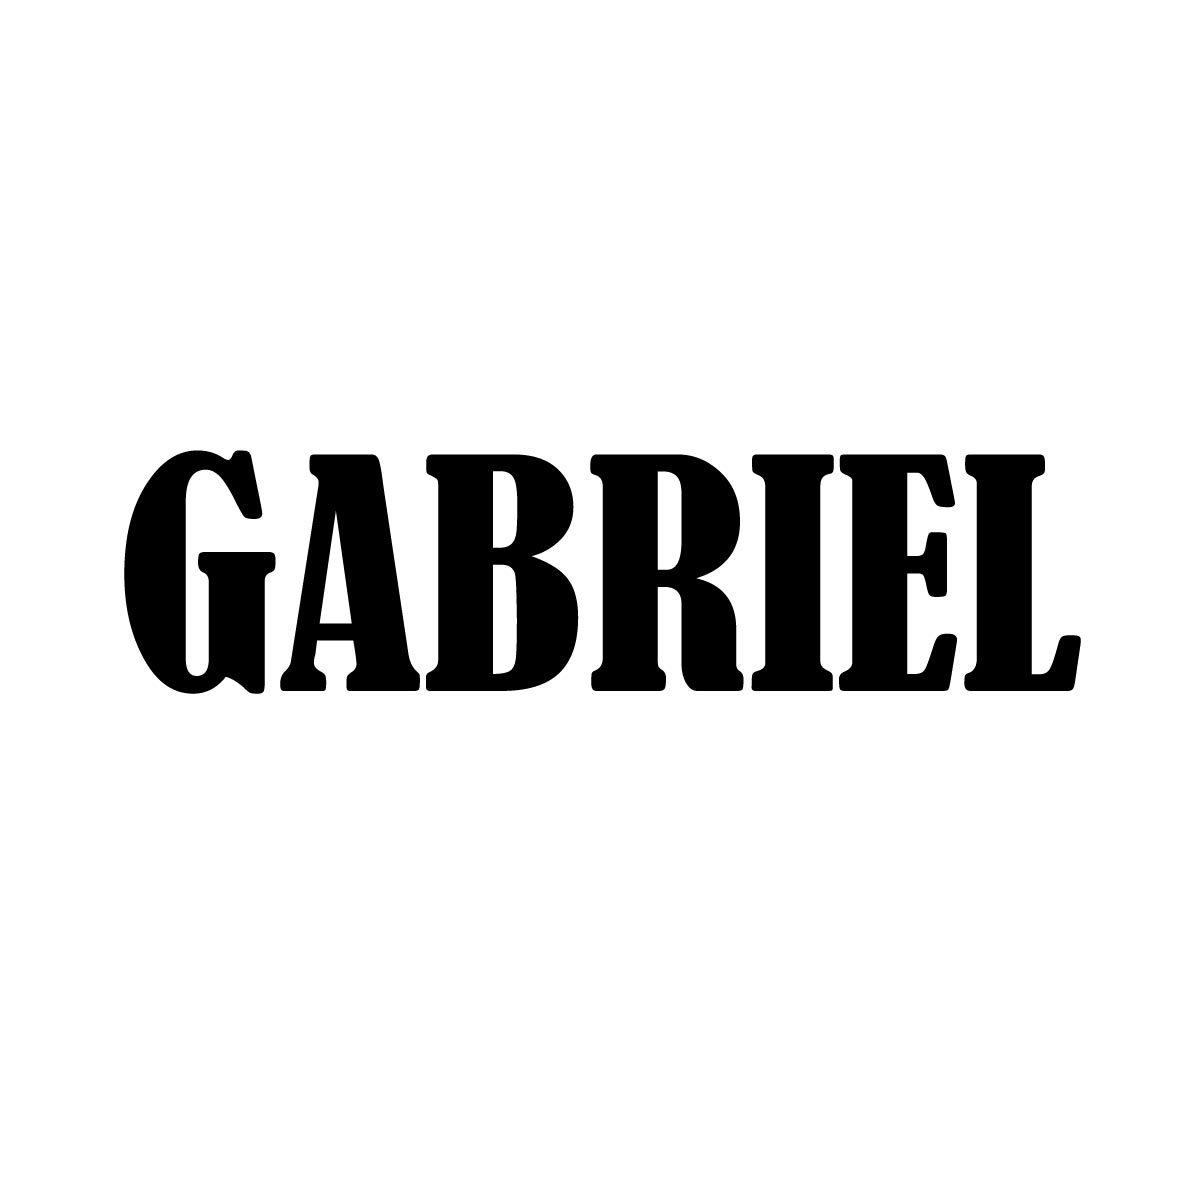 Jual Gabriel Molly Sling Bag Wanita Hitam Terbaru Harga Promo Sepatu Anak Cewek Blackkelly Hbl491